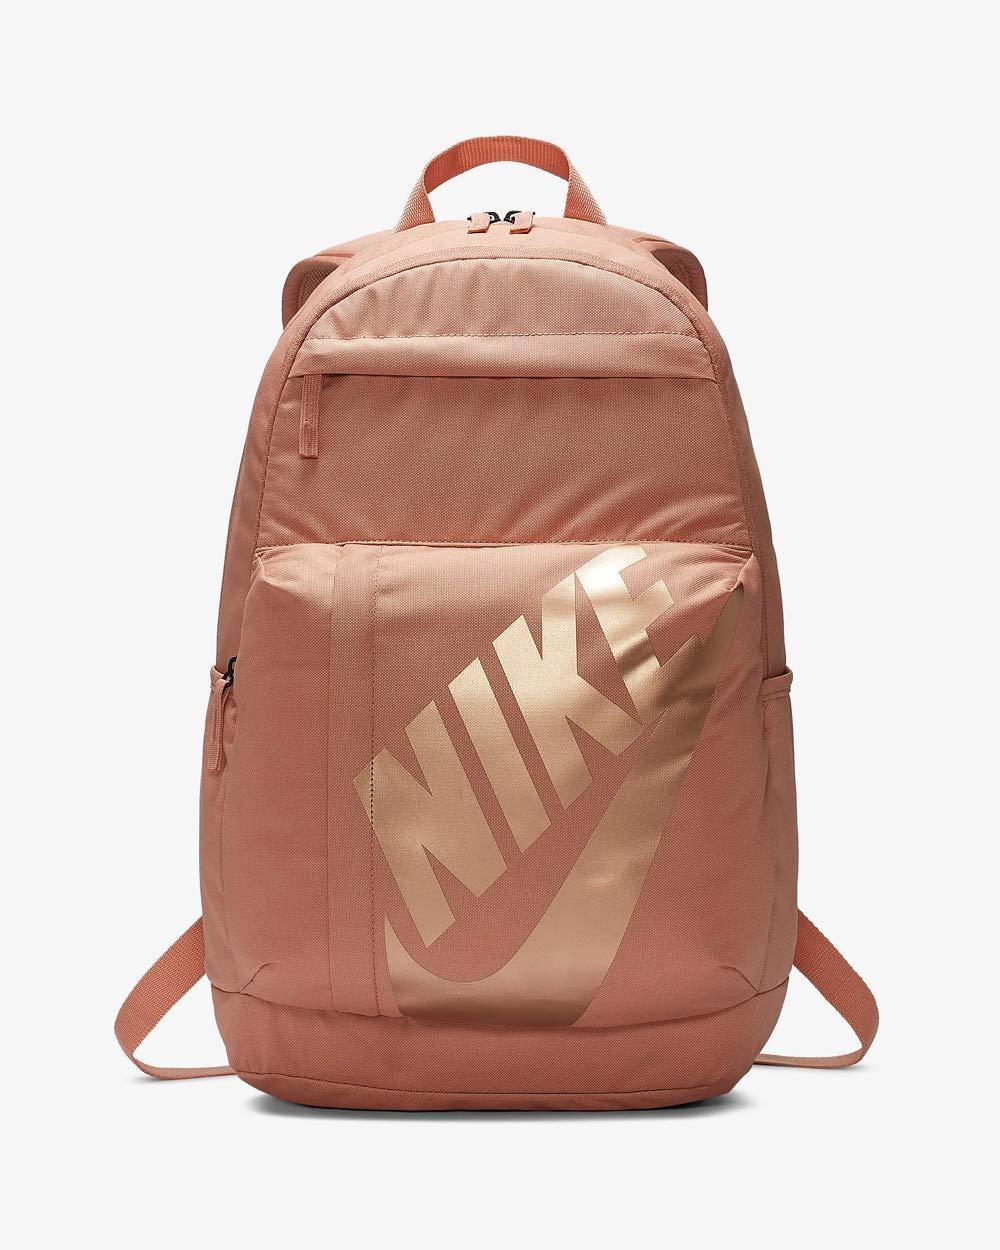 71hdBwqME5L - NIKE NikeSportswearMujerShoppers y bolsos de hombroRosa (Rose Gold) 30x15x48 centimeters (B x H x T)